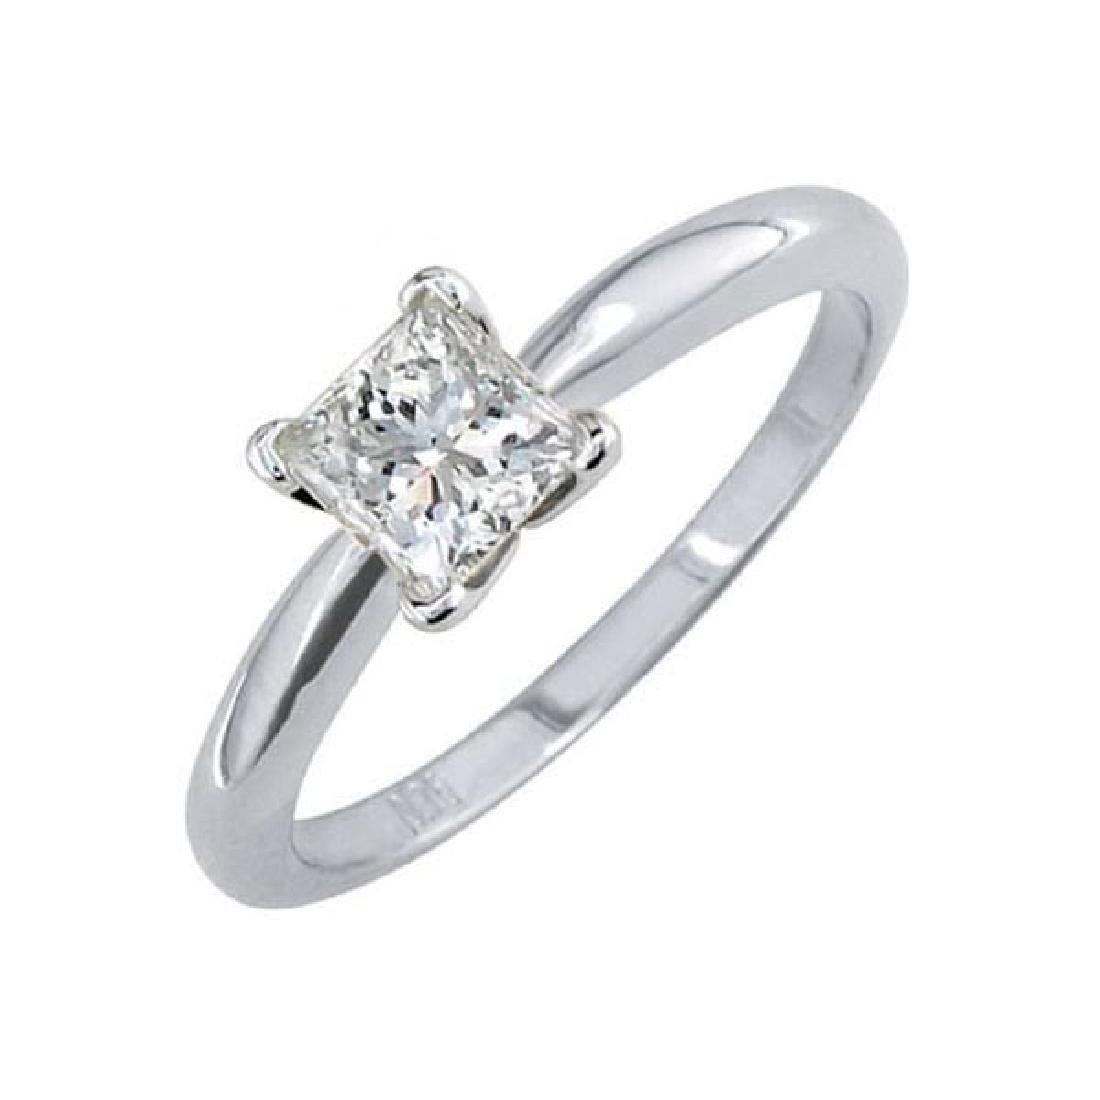 Certified 0.7 CTW Princess Diamond Solitaire 14k Ring D